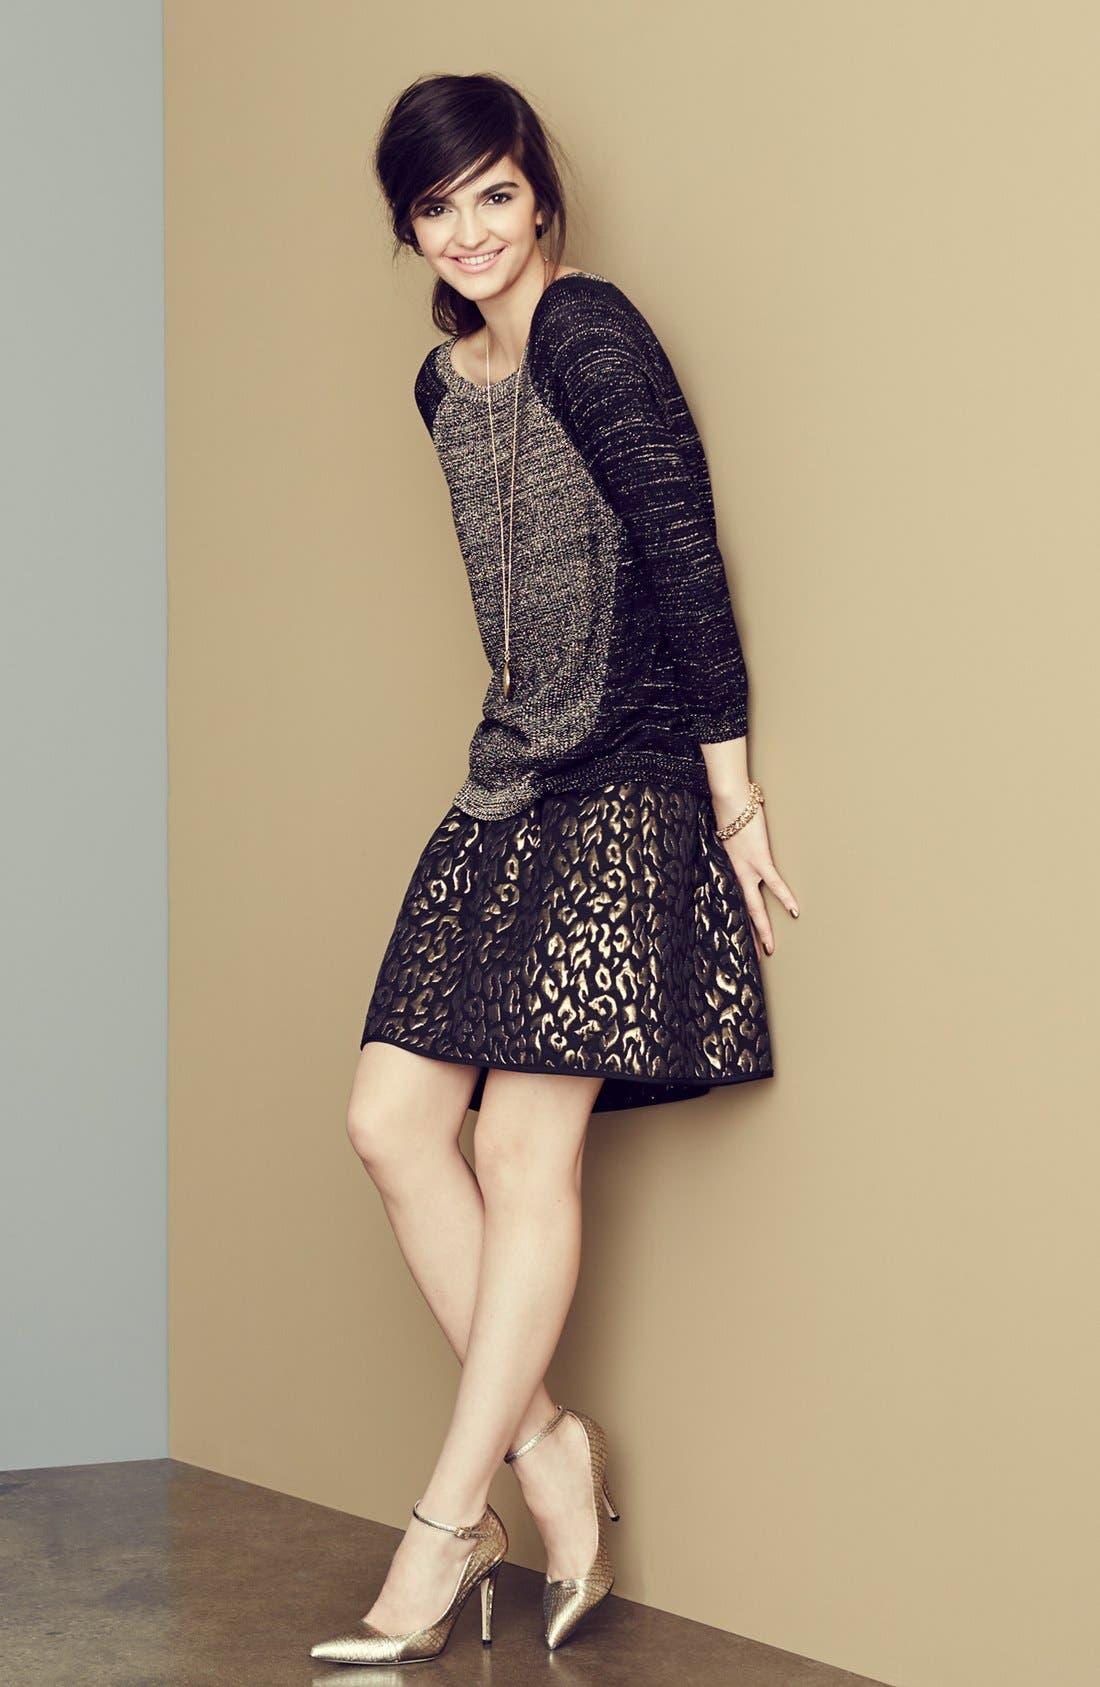 Alternate Image 1 Selected - Kenneth Cole New York Metallic Sweater & Print Skirt